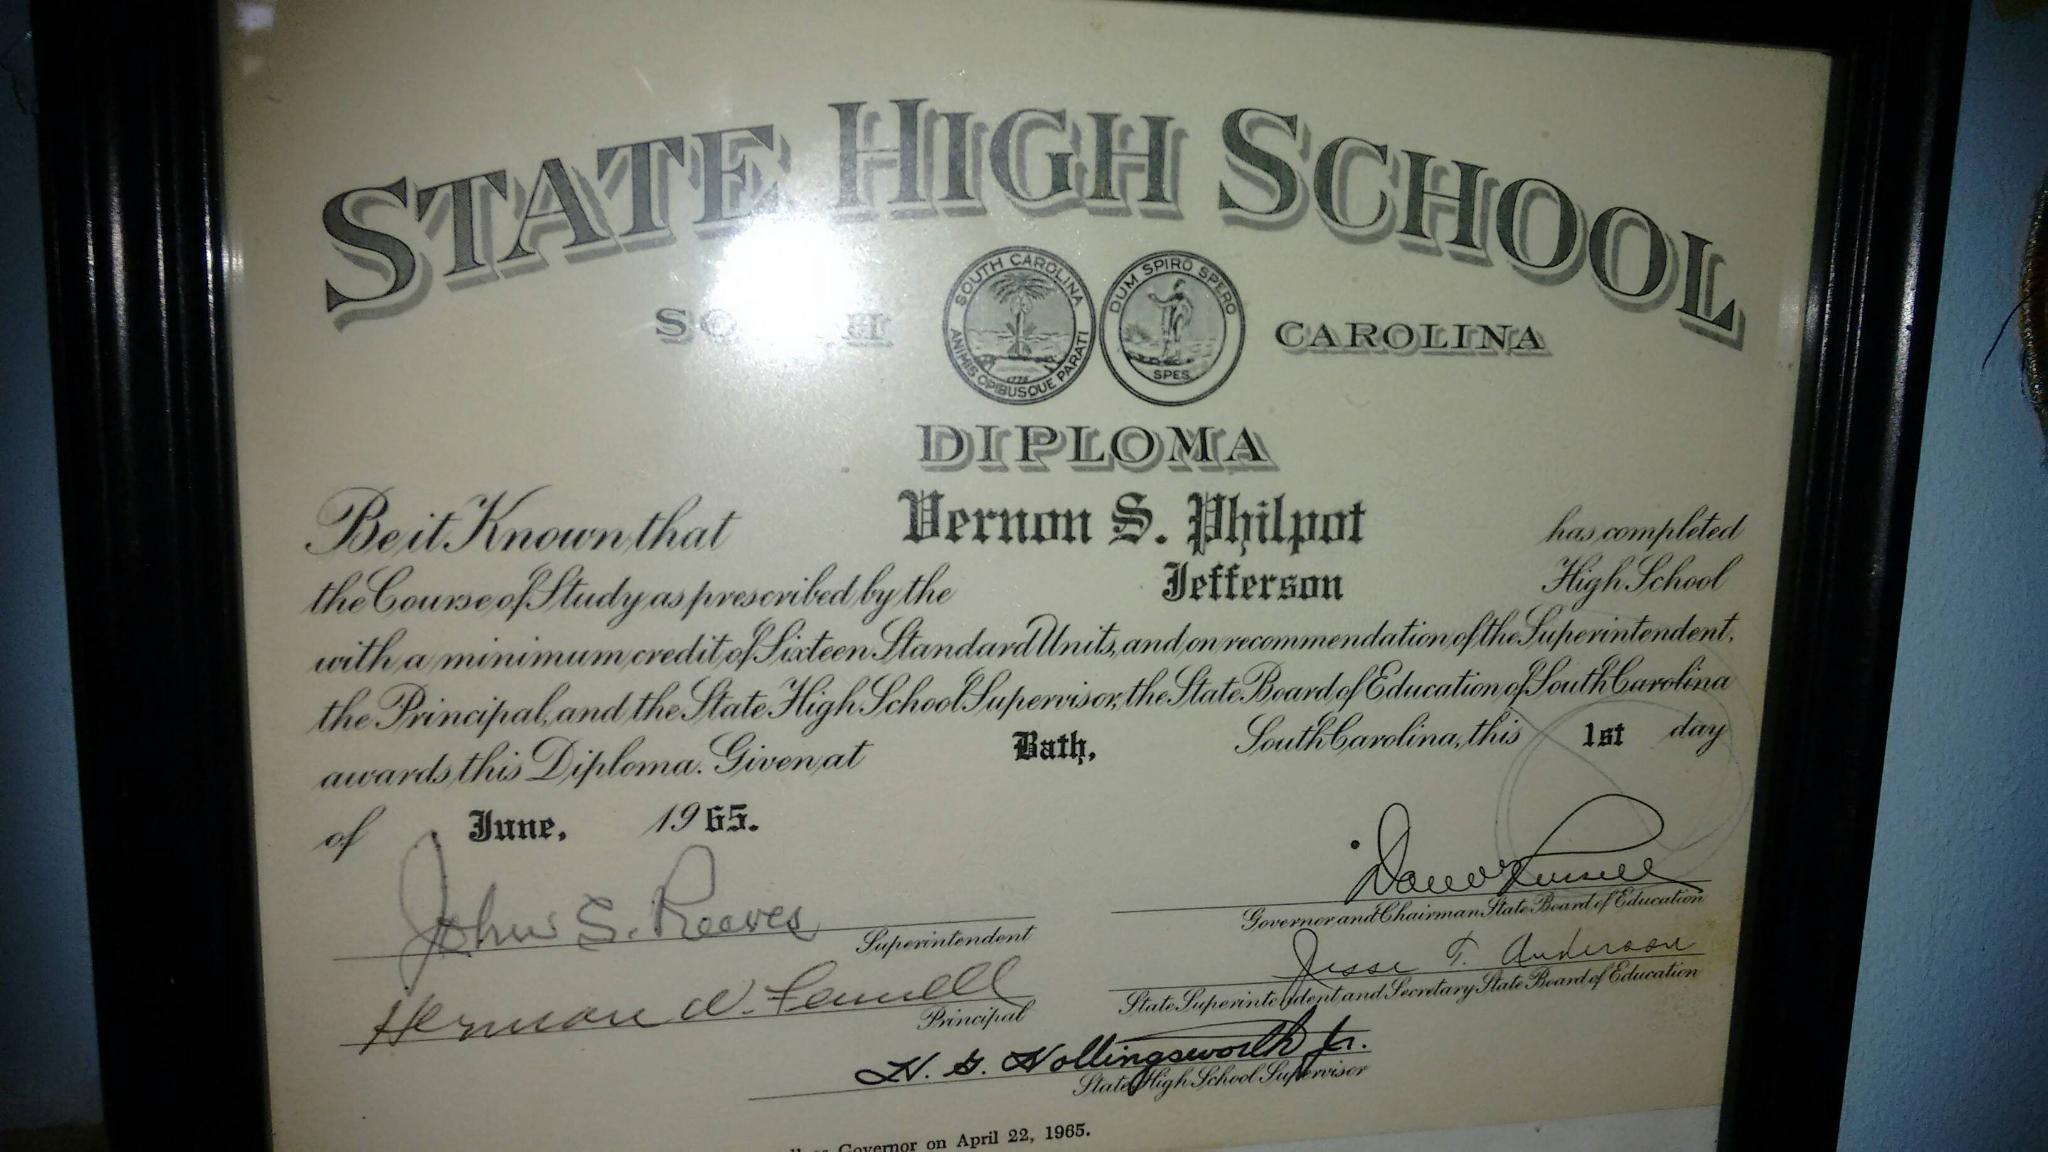 https://0201.nccdn.net/1_2/000/000/0db/9d7/diploma.jpg